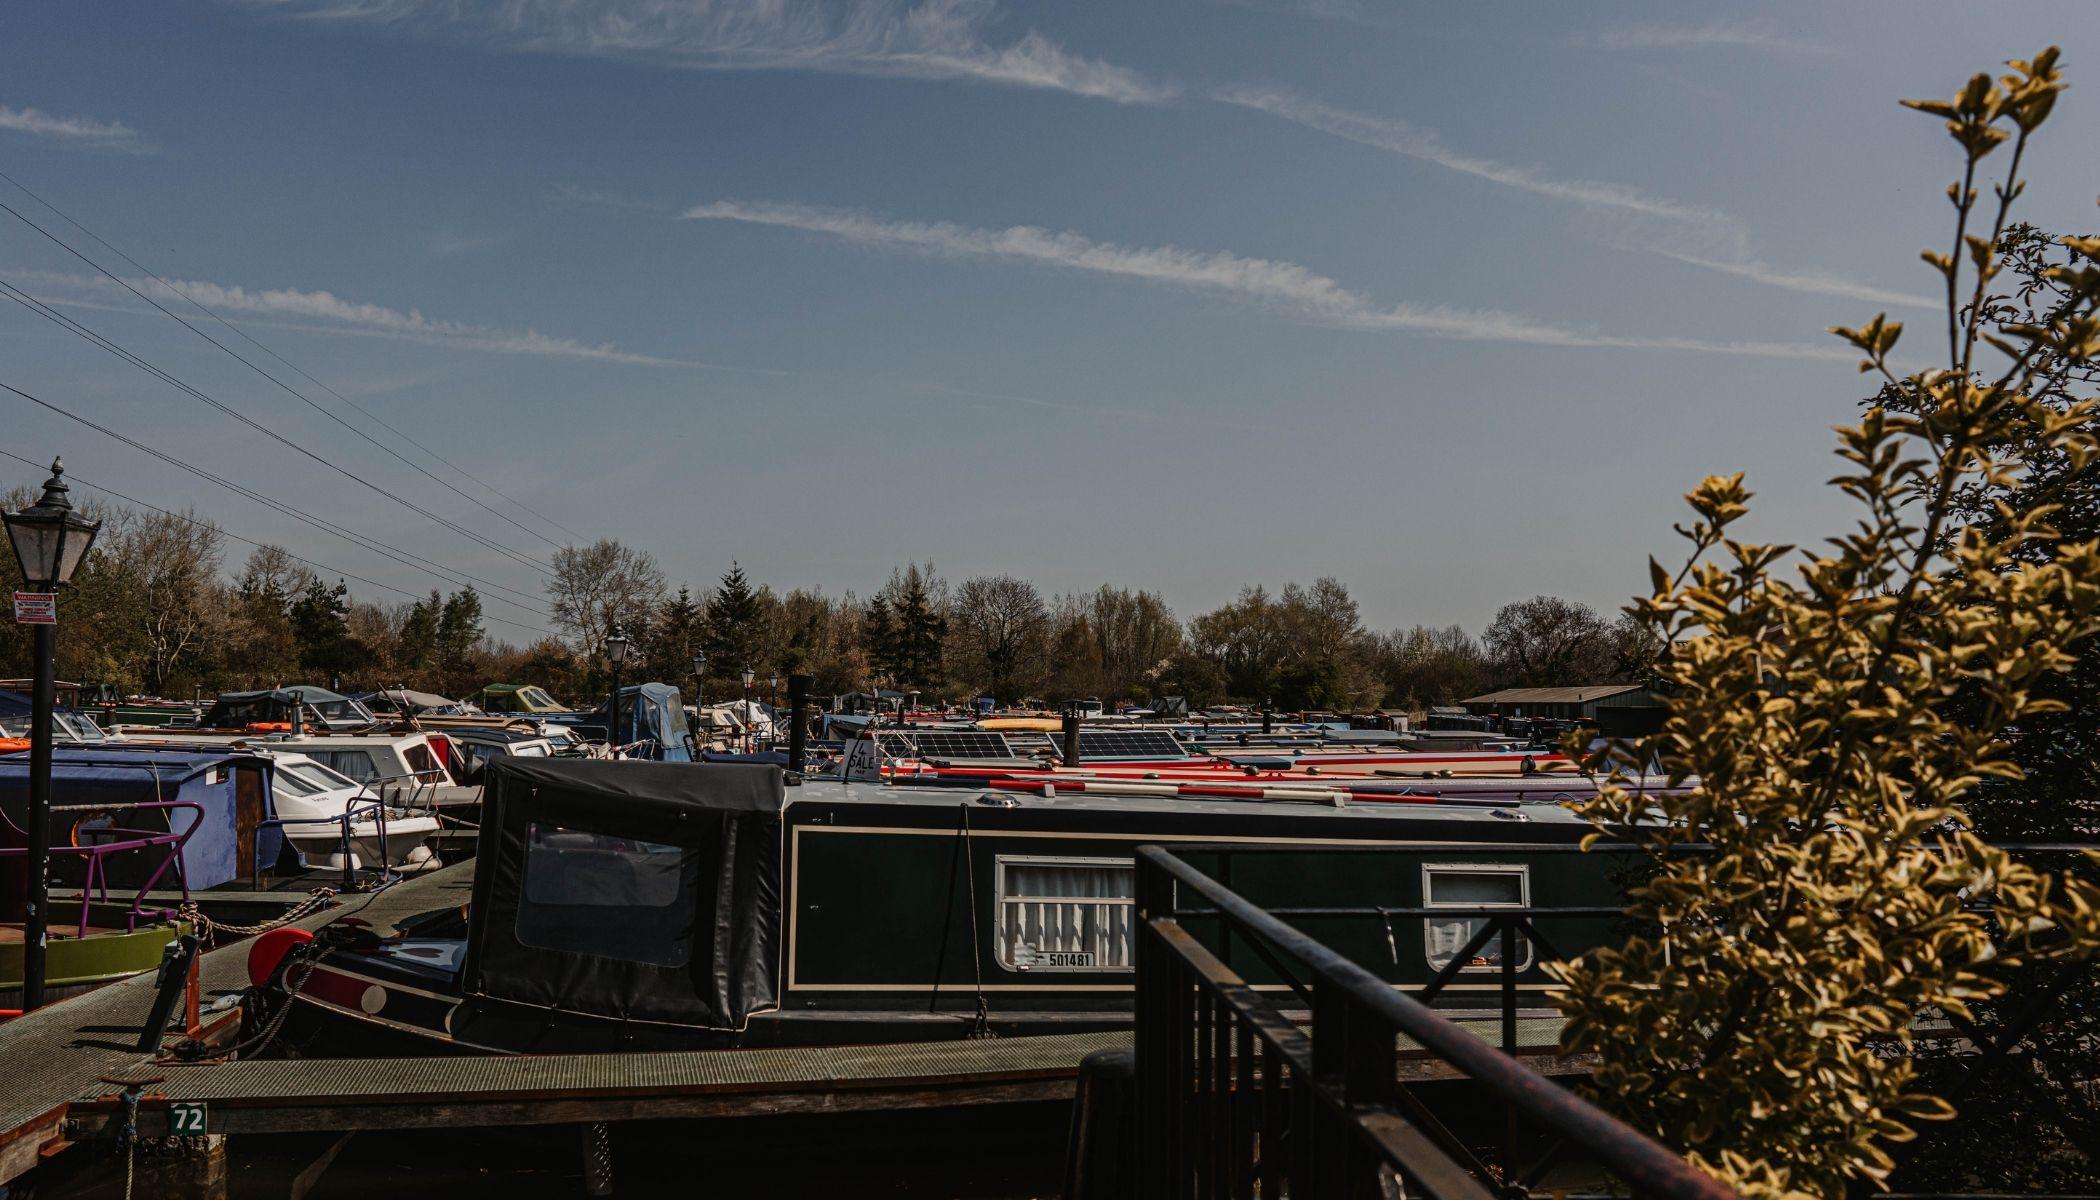 Views of The Marina